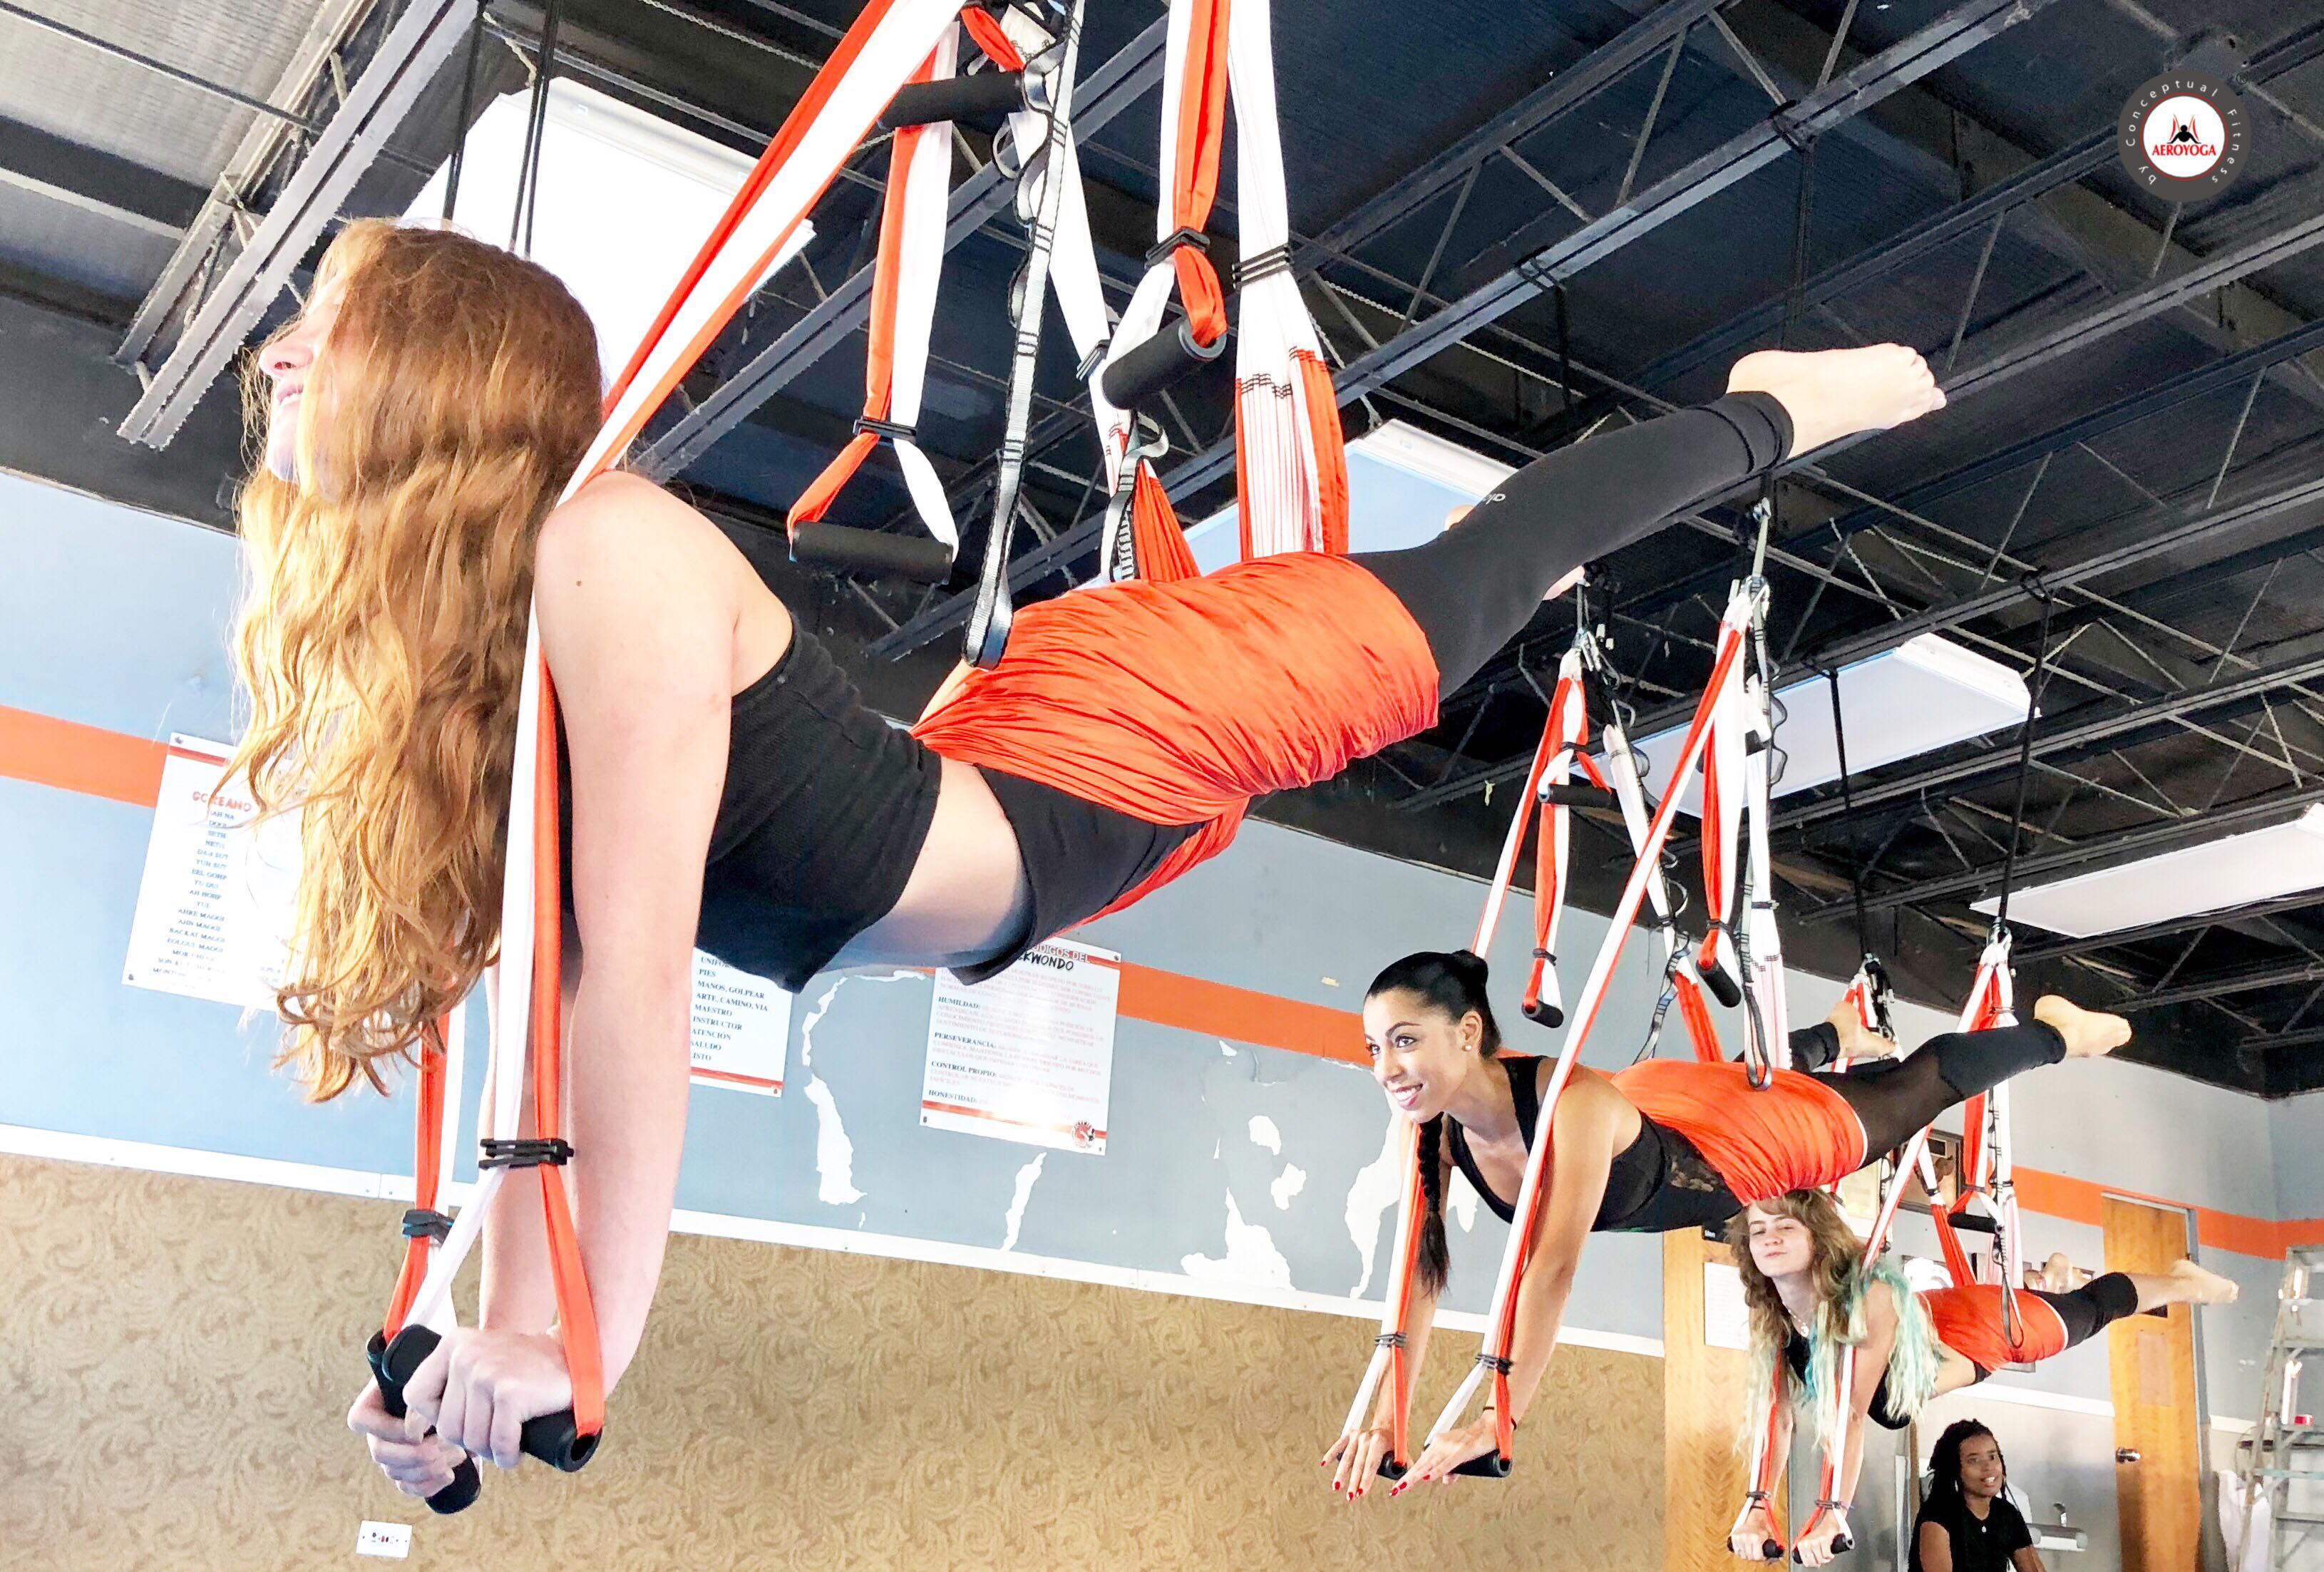 Formación Profesores Pilates Aéreo, Descubre el Poder del AeroPilates ®